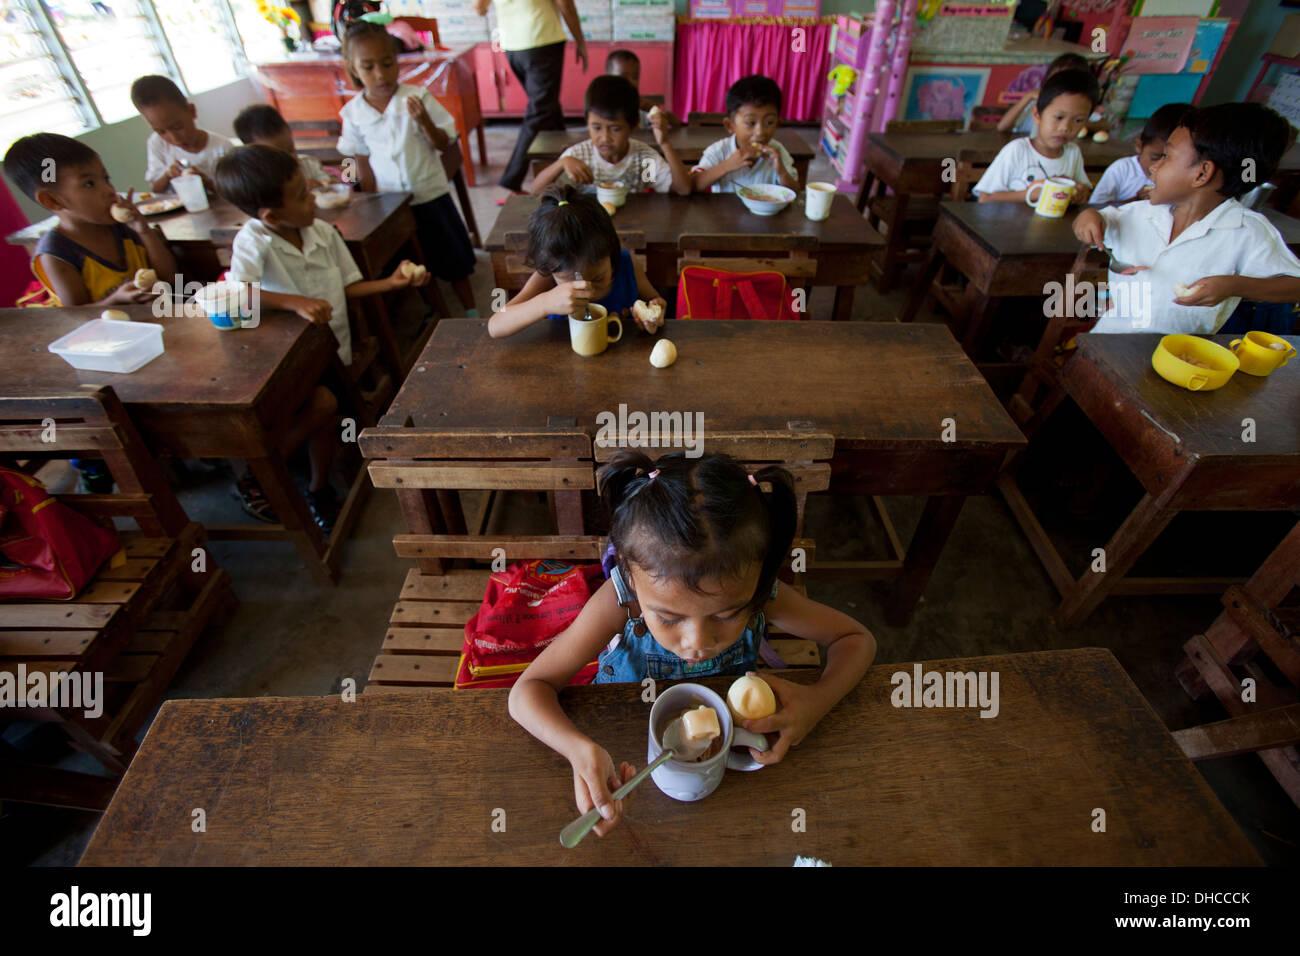 Children enjoy a free lunch during a feeding program event at Wasig Elementary School in Wasig, Oriental Mindoro, Stock Photo